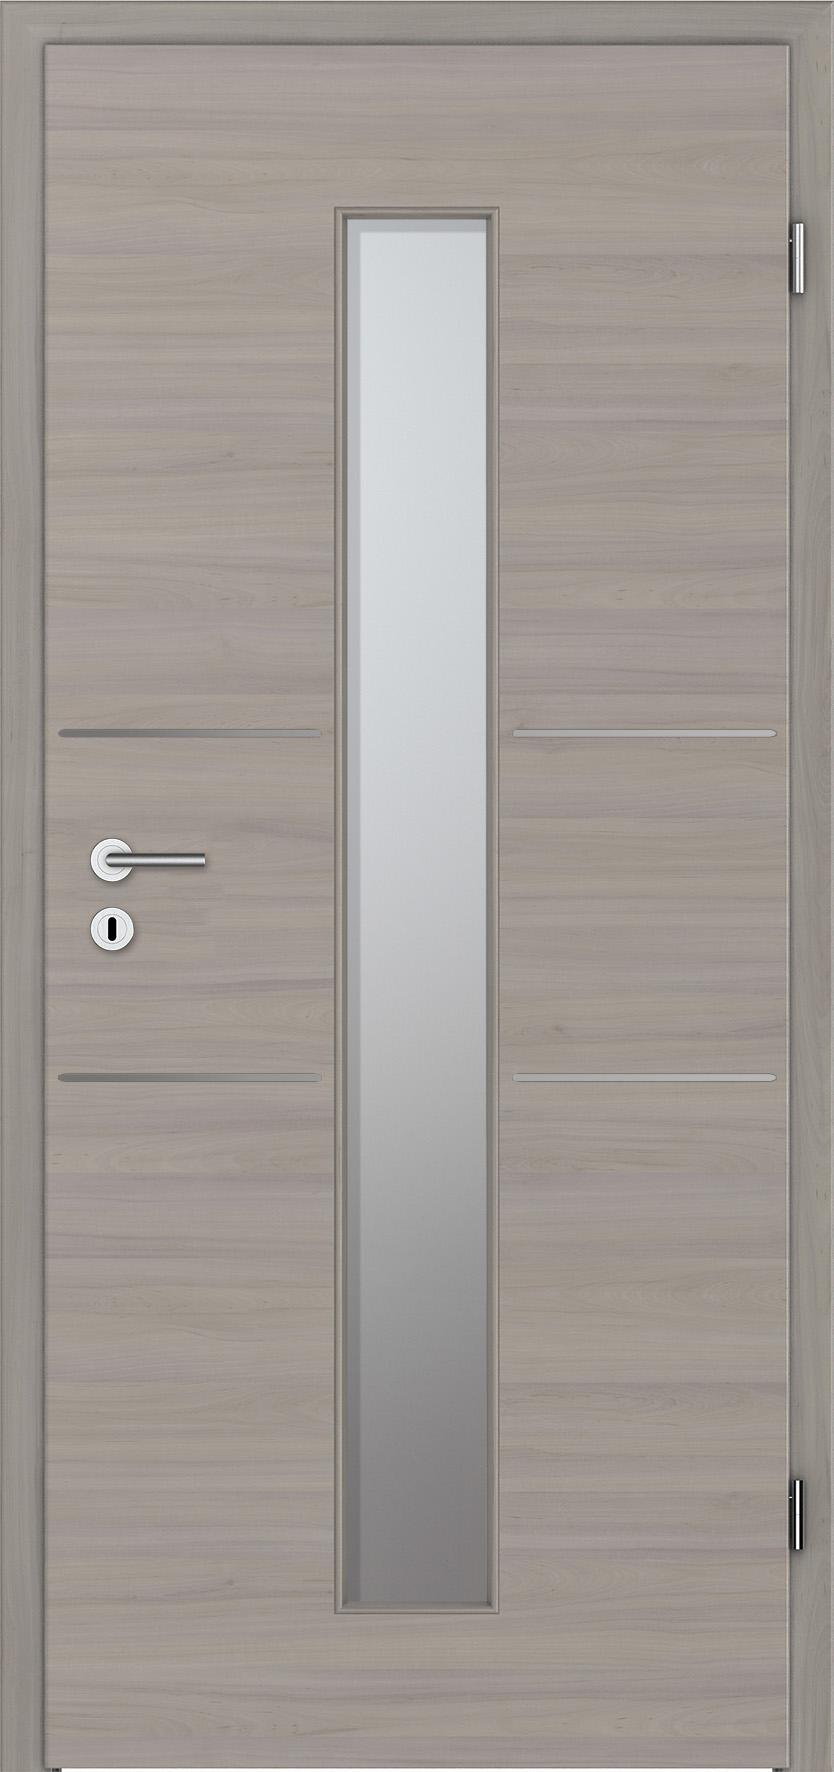 RY-533-LA2 CPL Pera Grey DQ